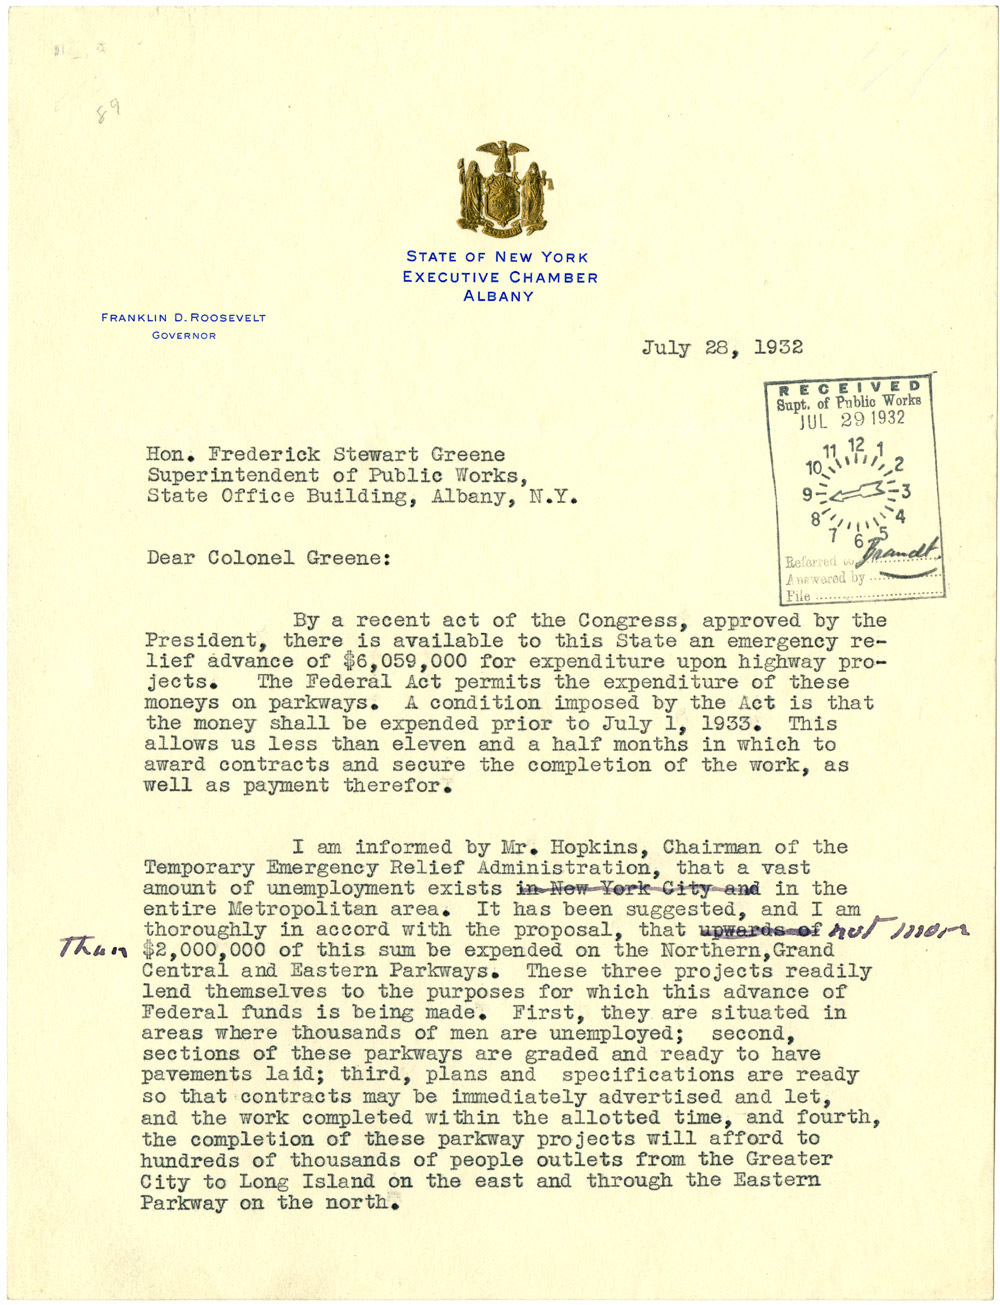 Franklin D. Roosevelt to Frederick S. Greene, July 28, 1932. (GLC00224)